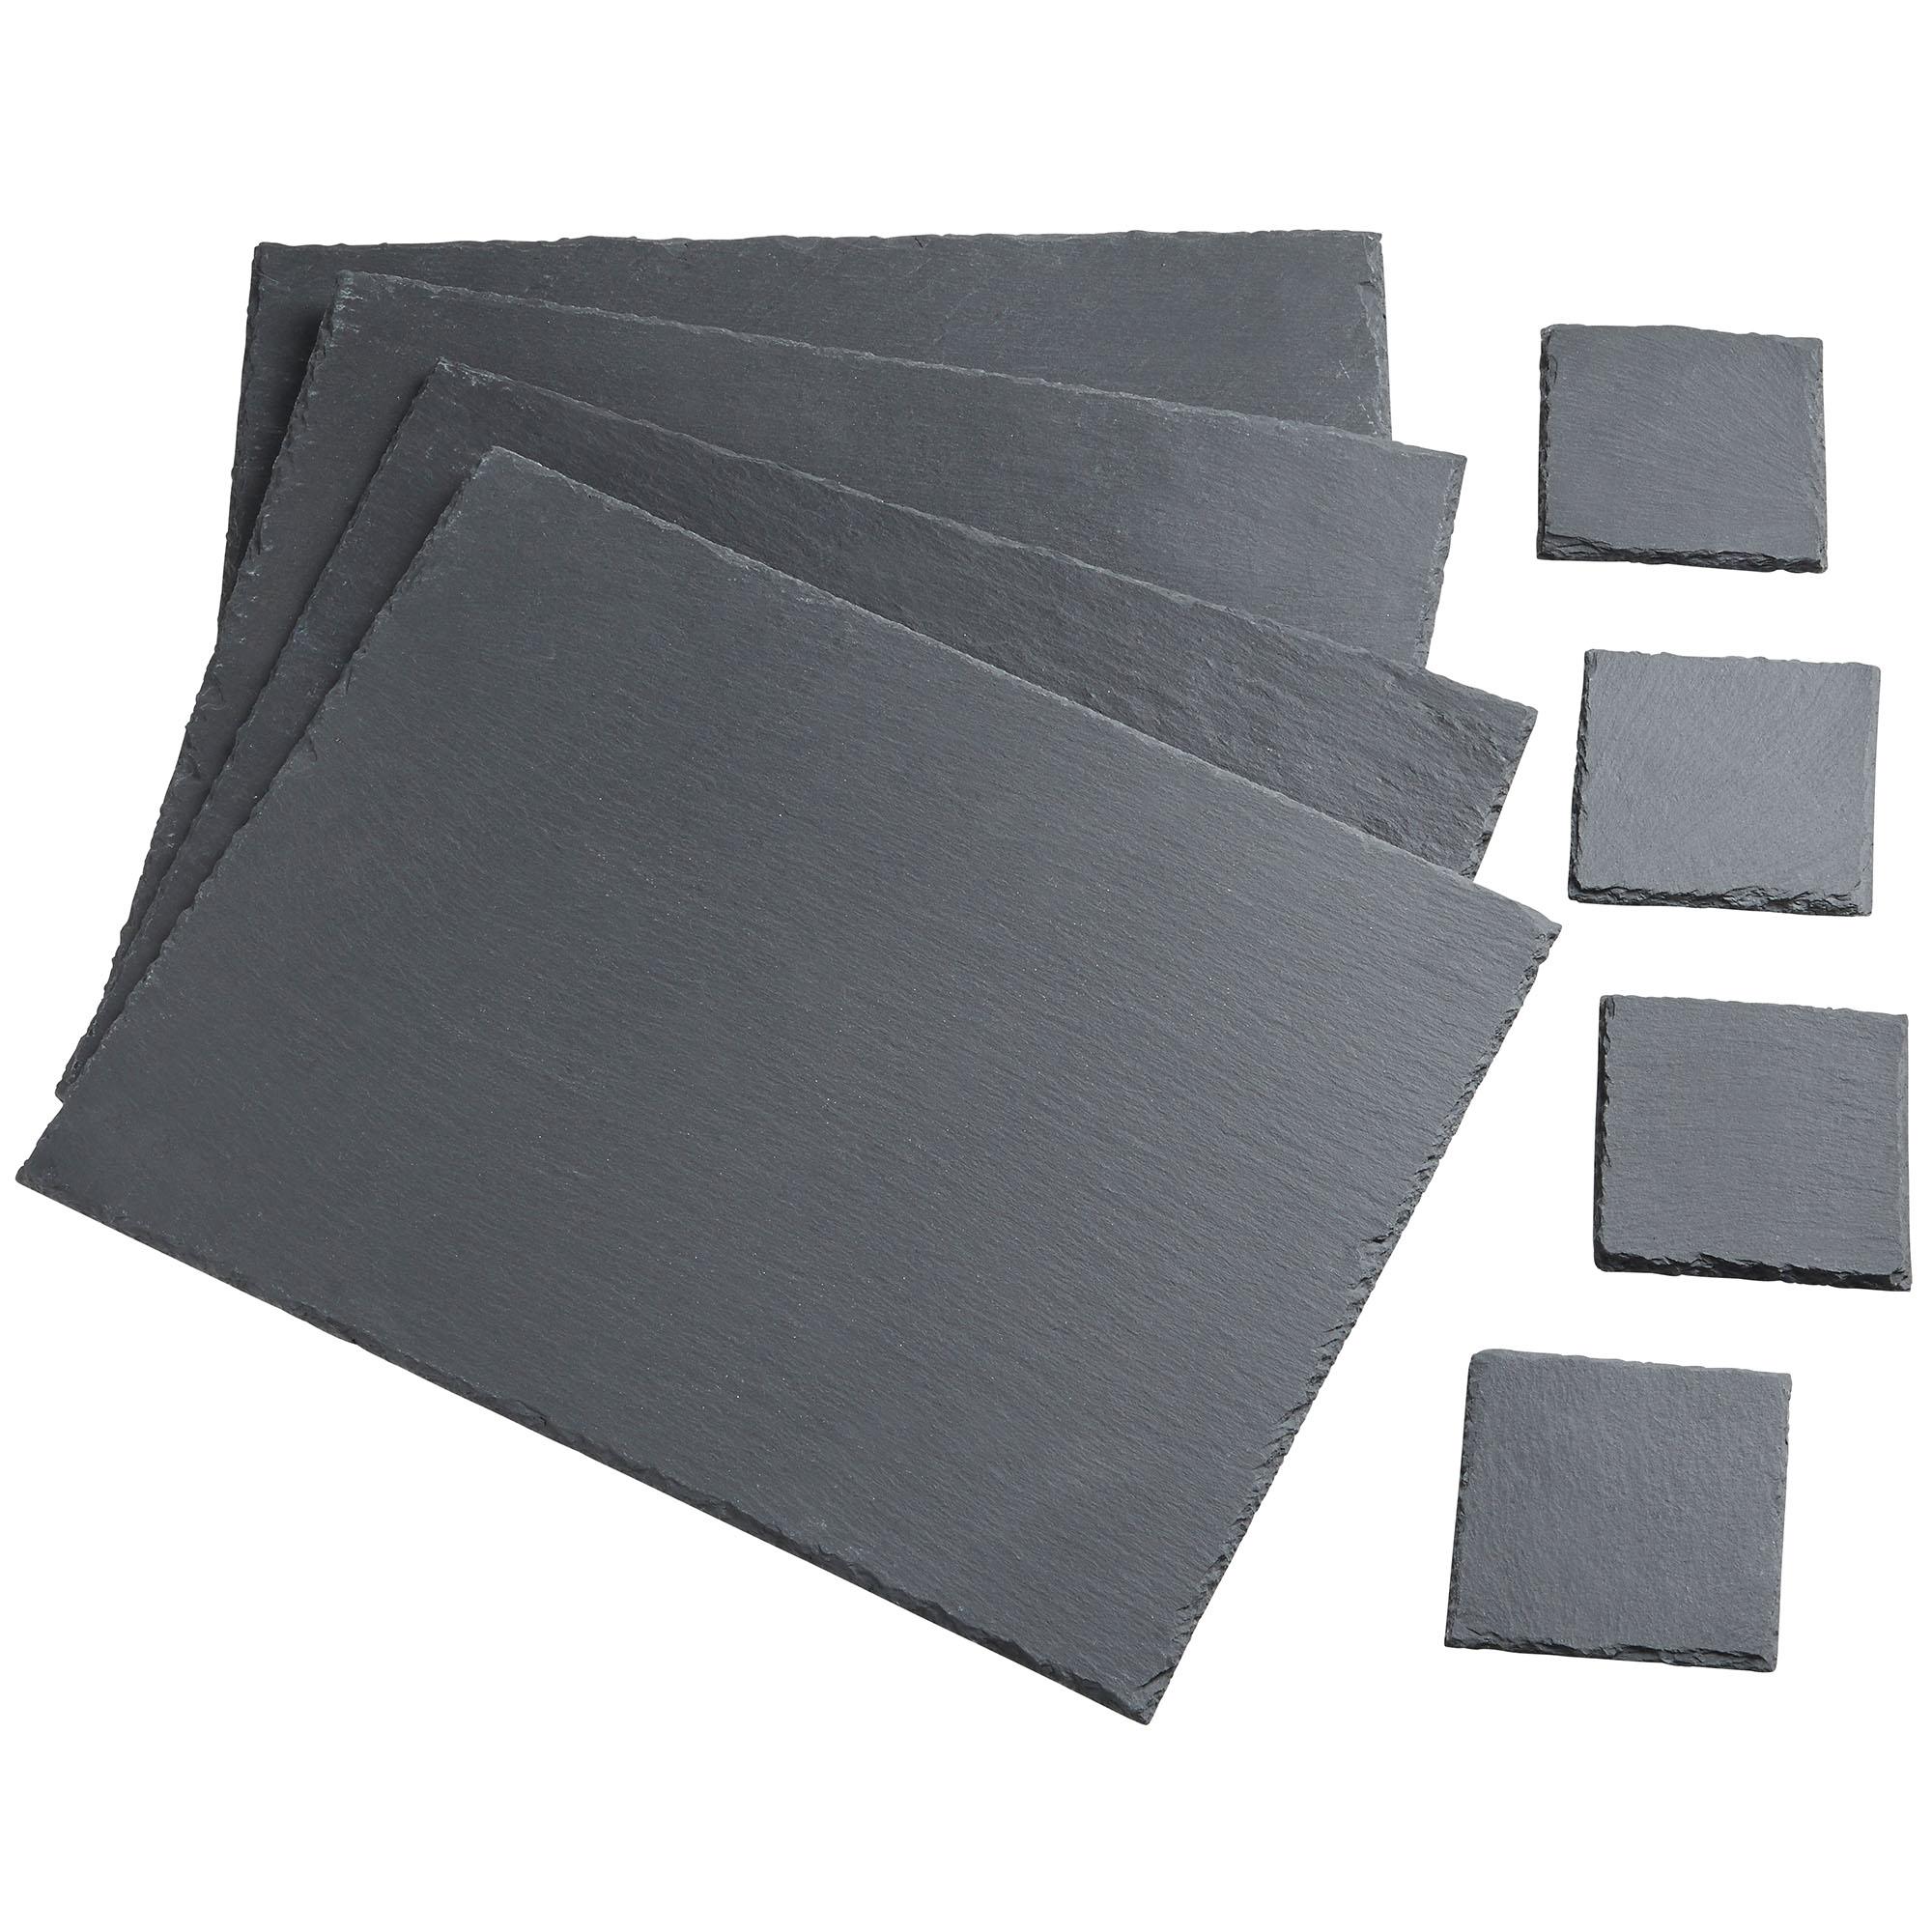 Vonshef 8 Piece Slate Placemat Set 4 X Mats Coasters Non Slip Heat Resistant 5056115717796 Ebay